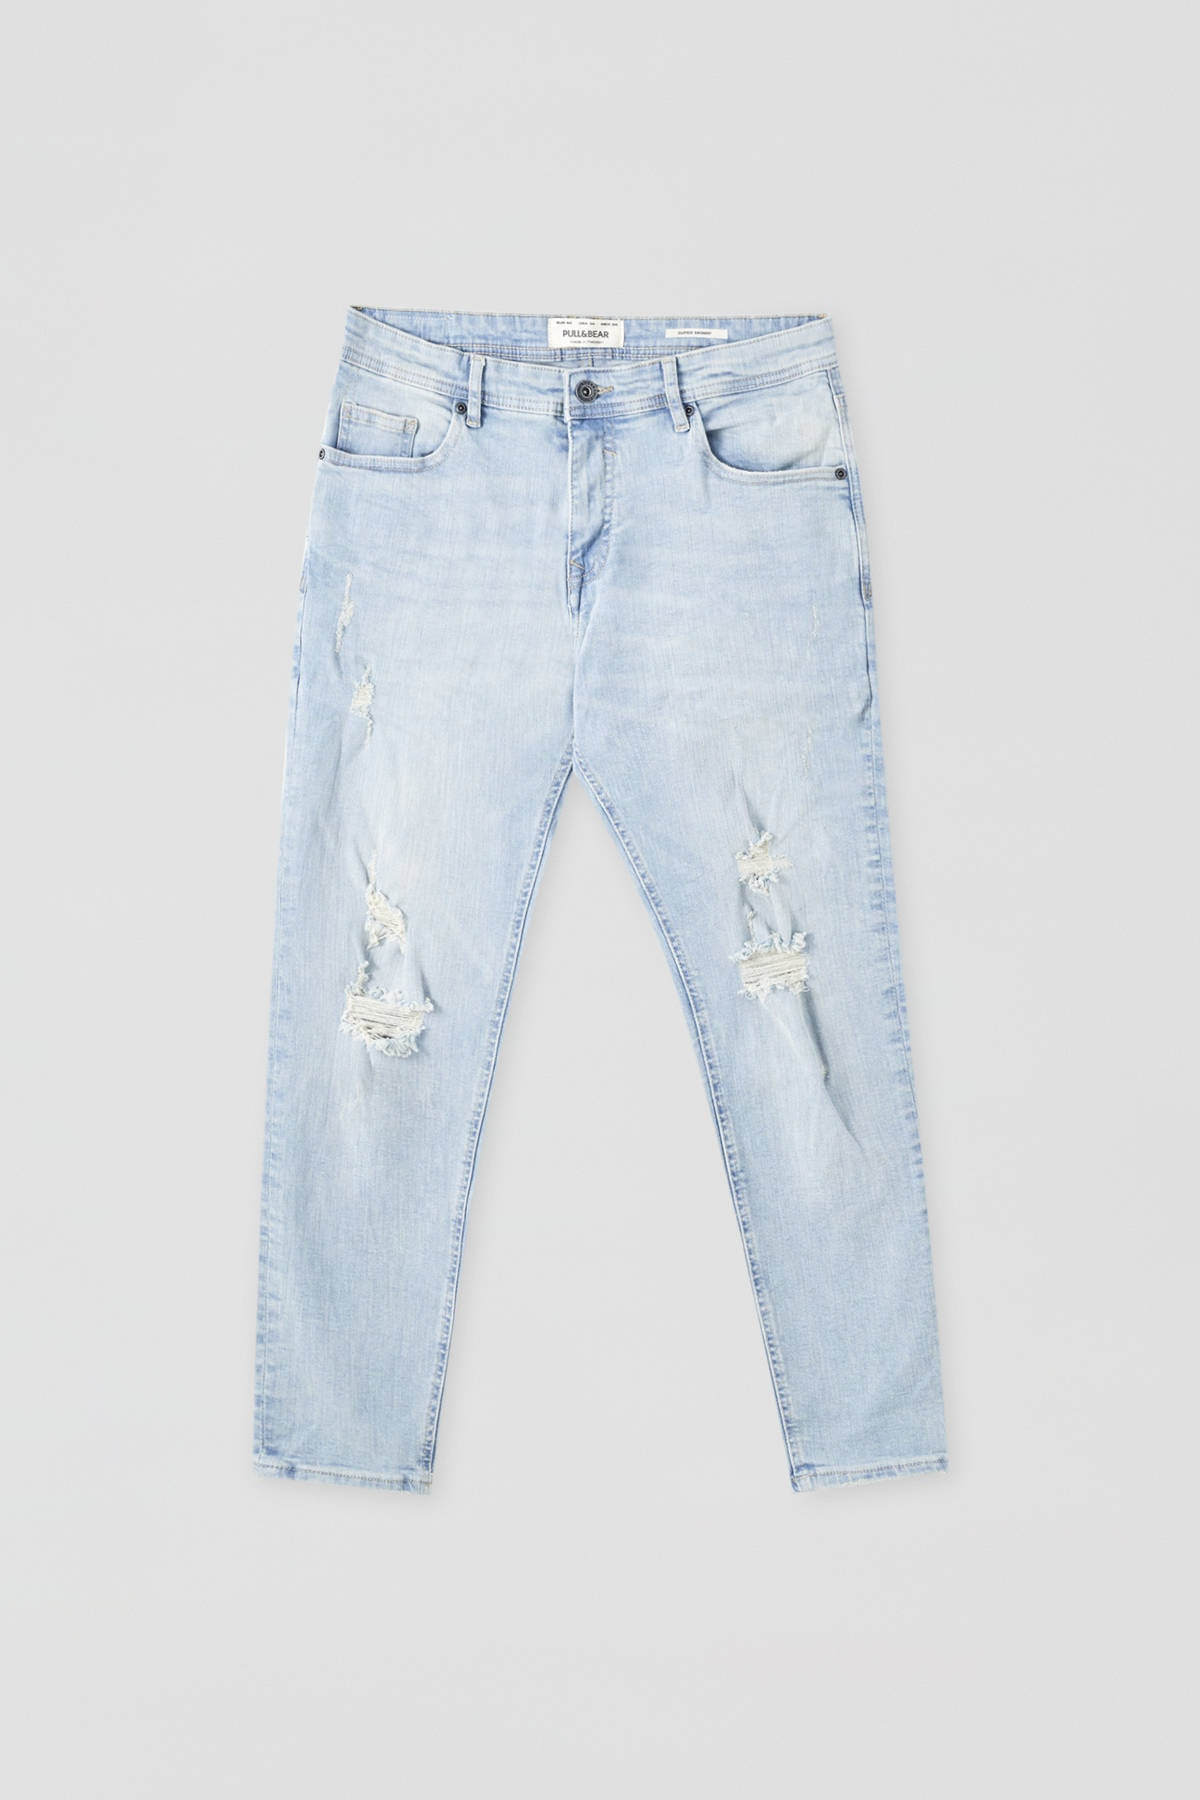 Pull & Bear Erkek Açık İndigo Distressed Detaylı Basic Super Skinny Fit Jean 09683500